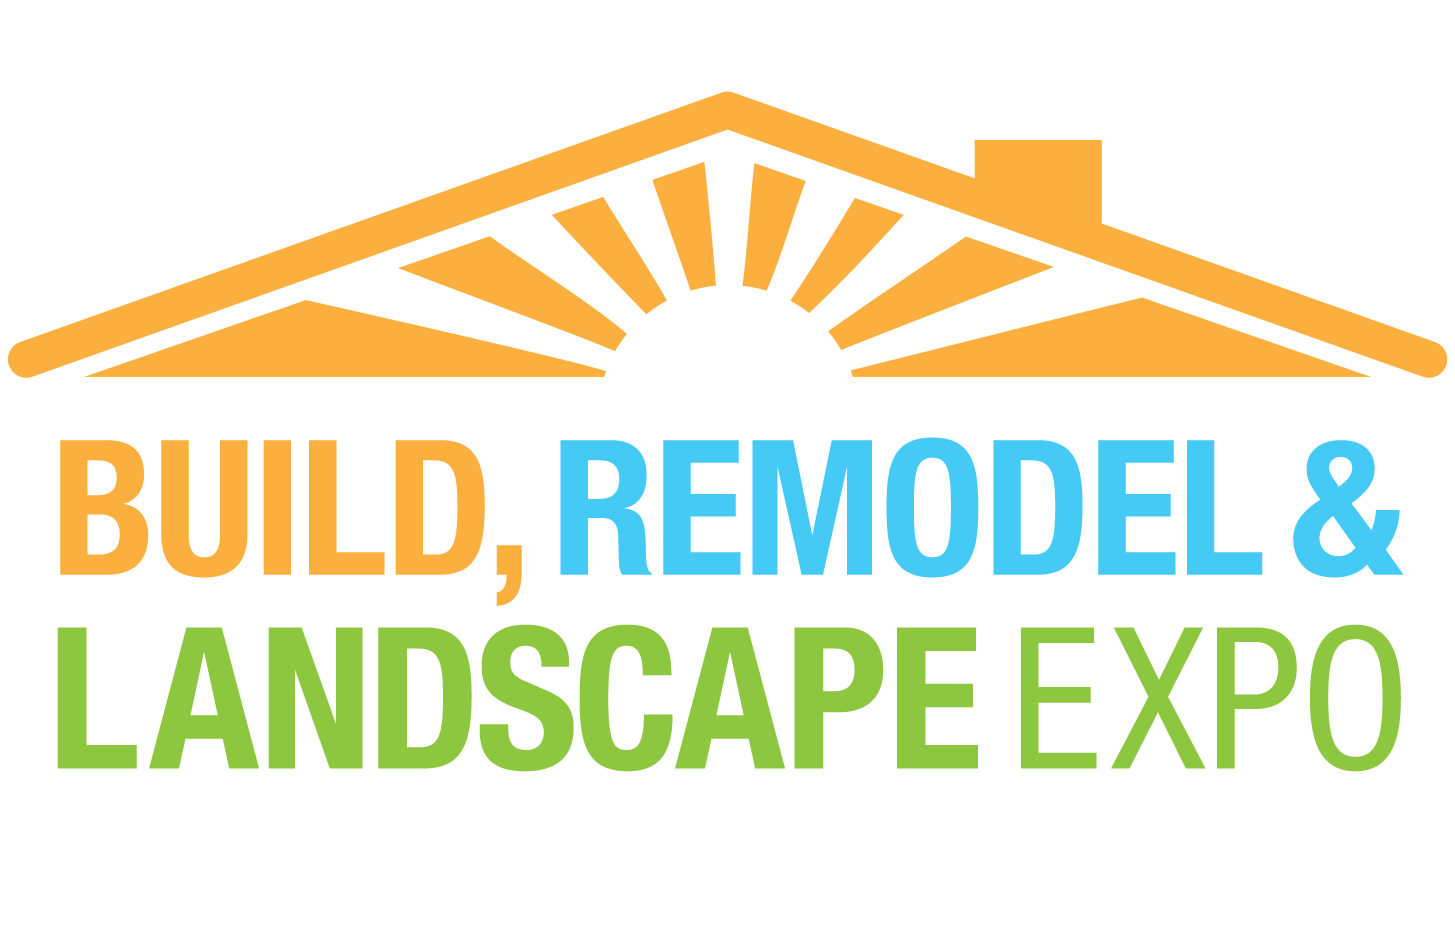 2017 Atlanta Build, Remodel and Landscape Expo